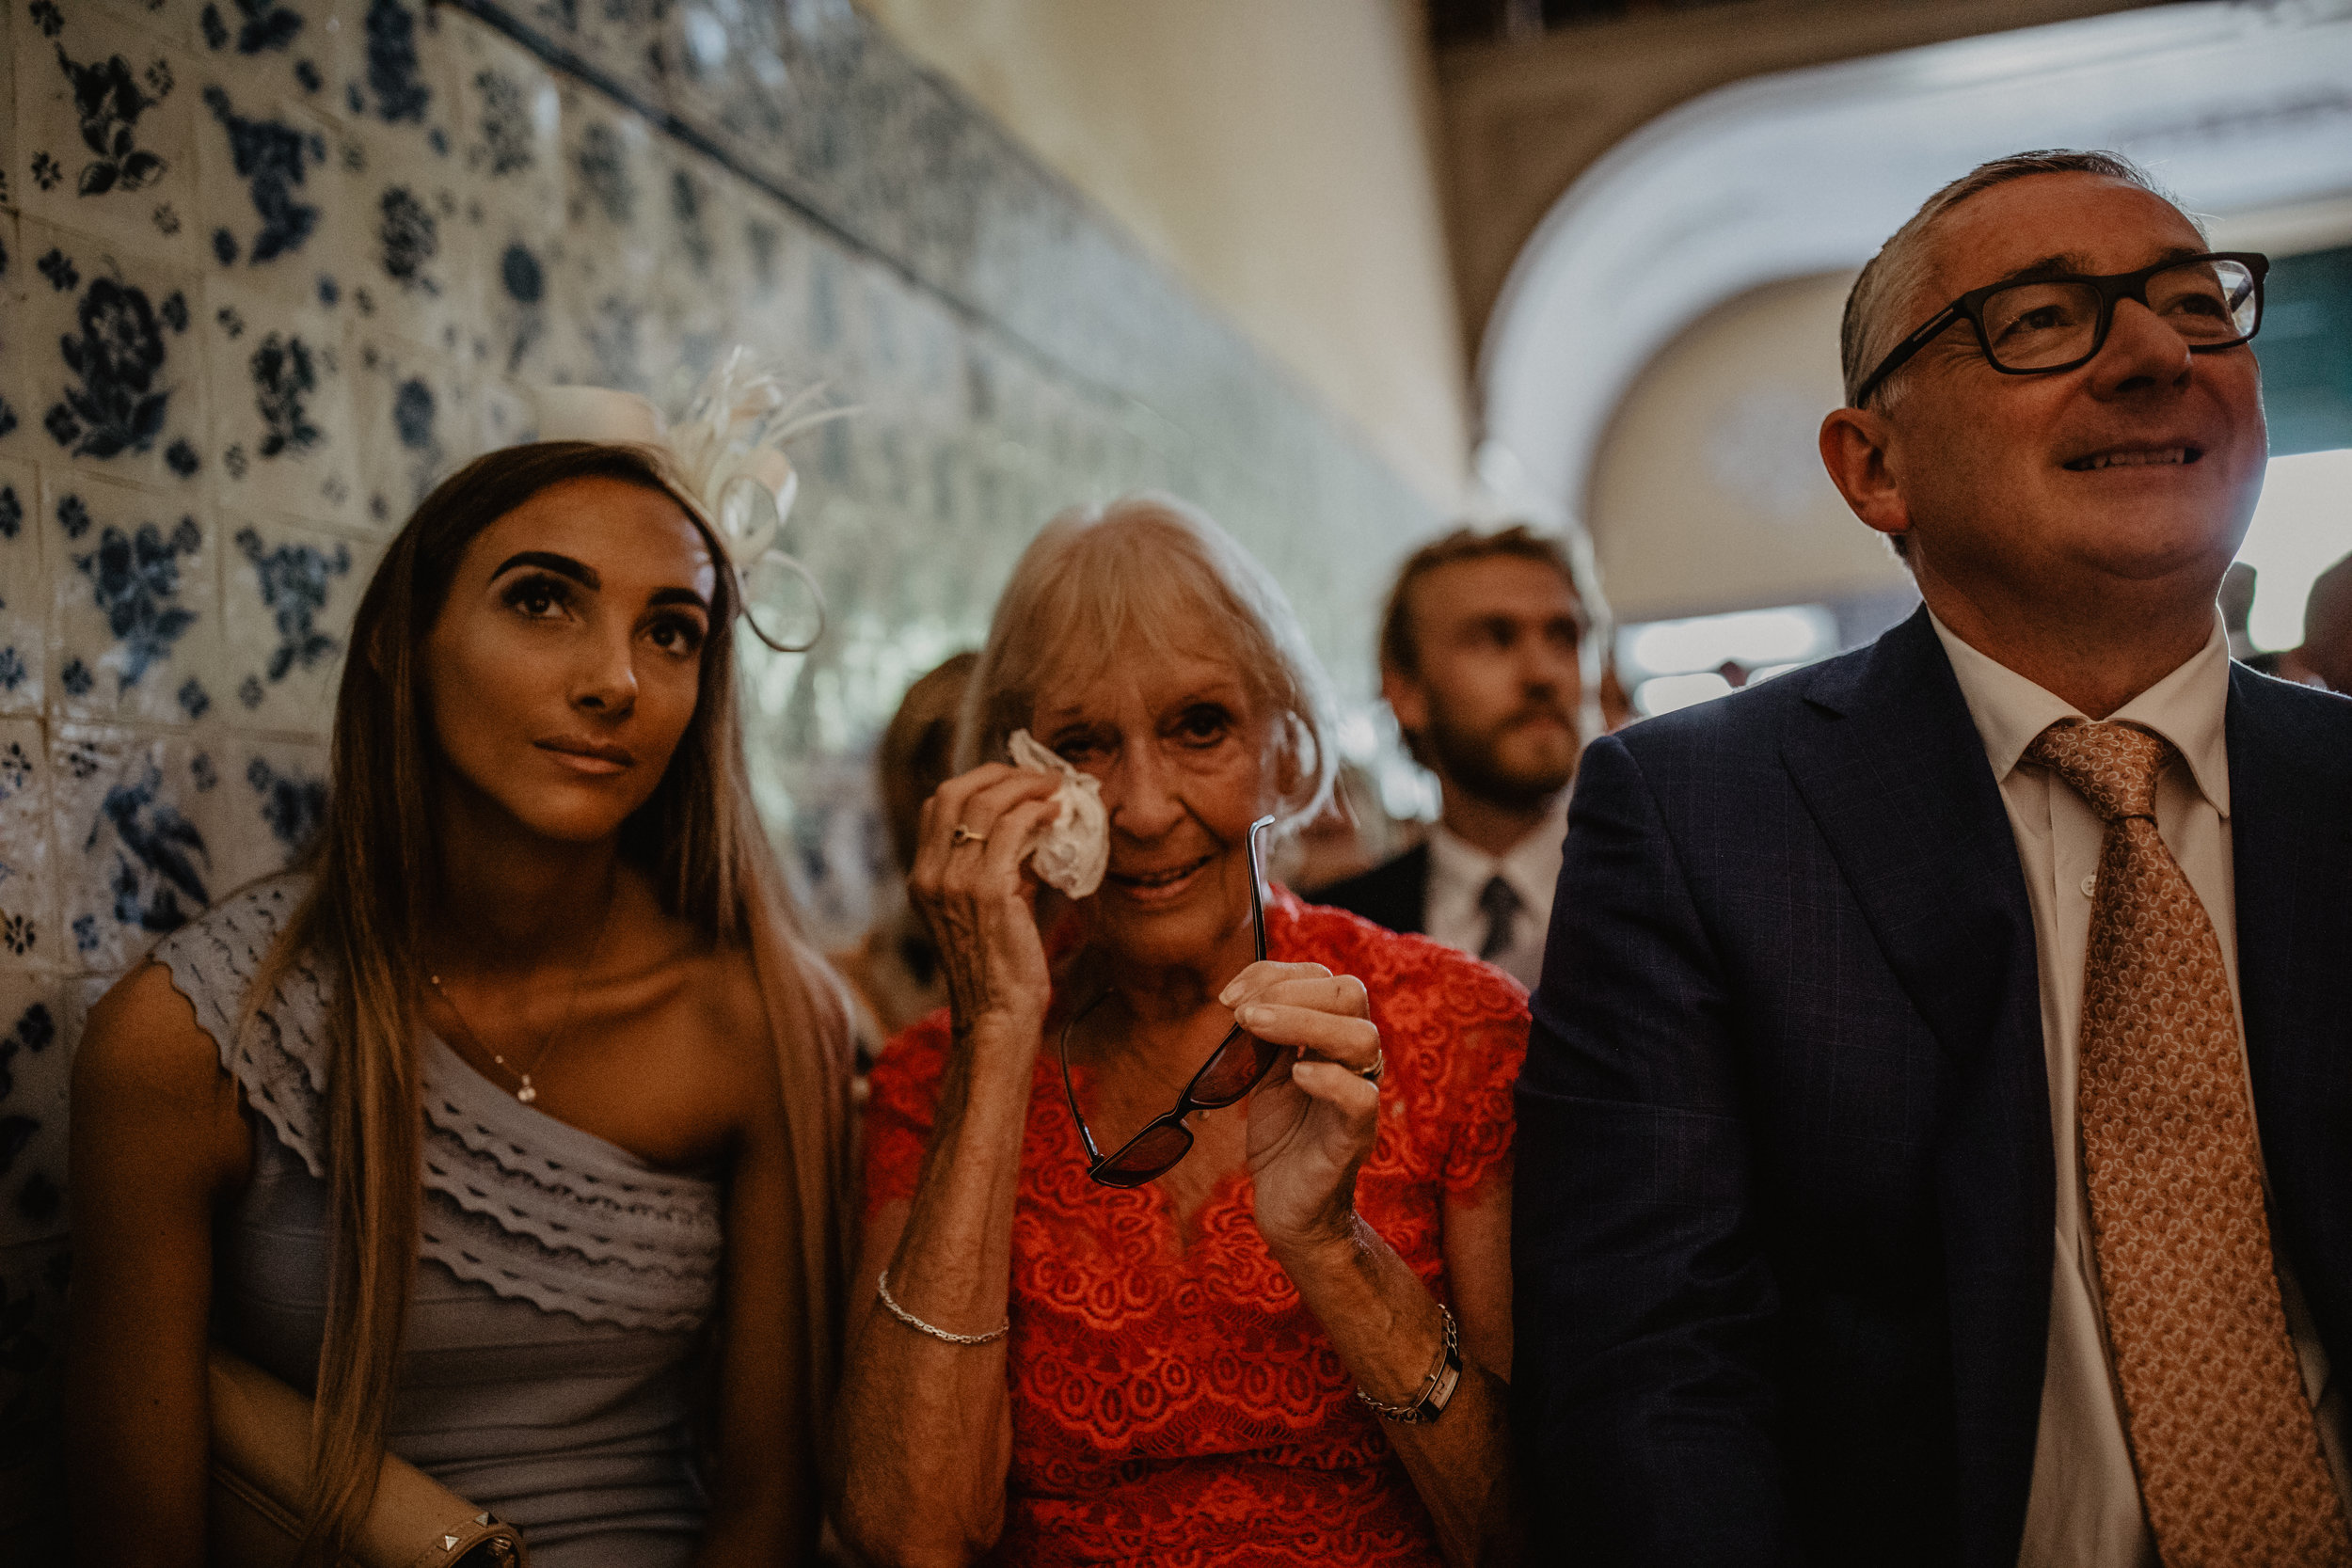 Lapela-photography-wedding-sintra-portugal-58.jpg